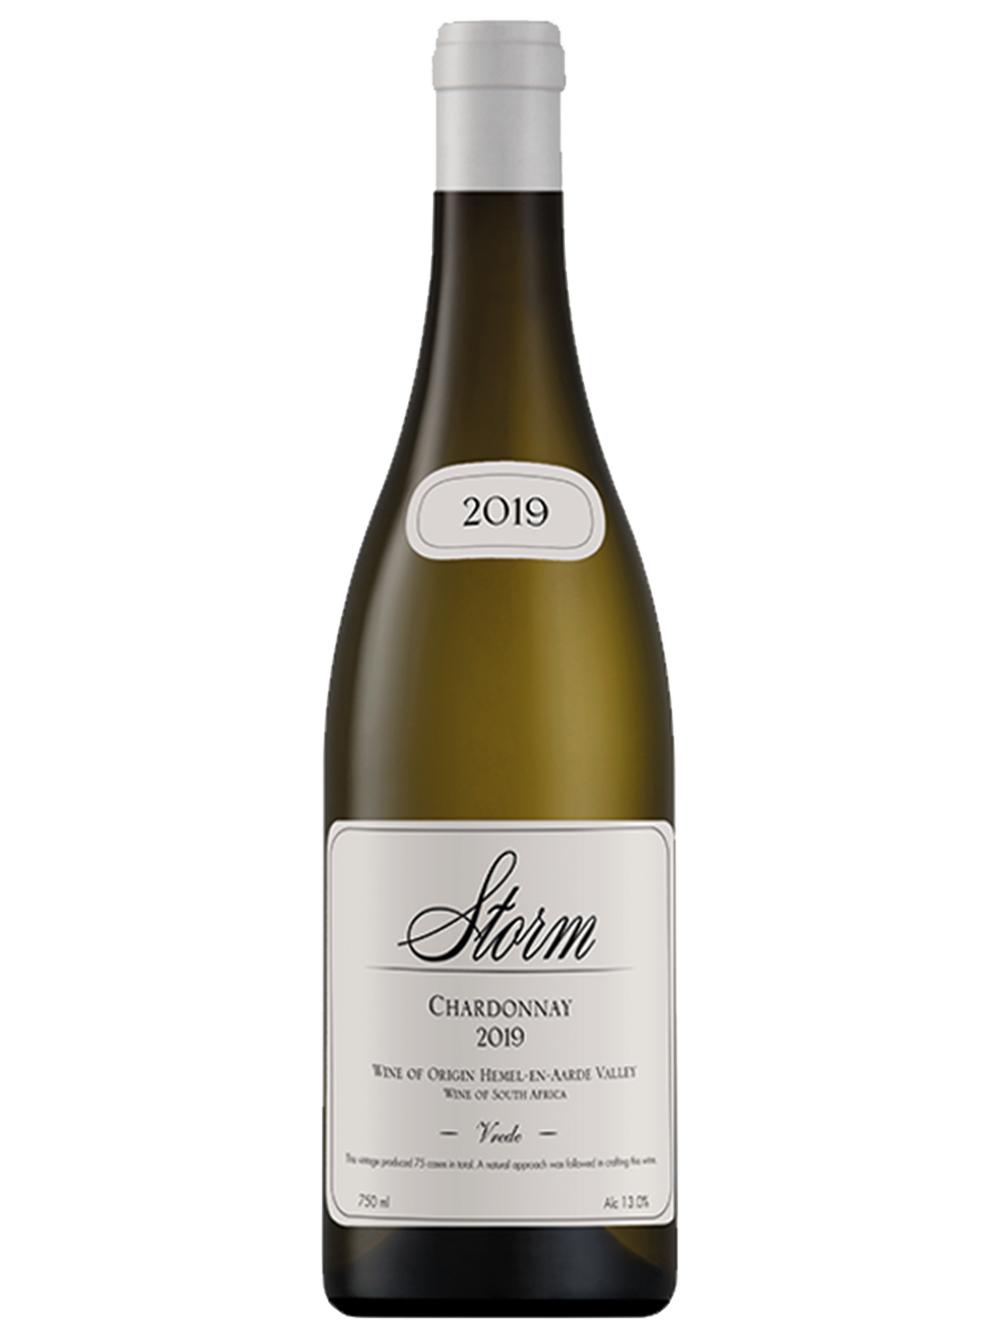 2019 Vrede Chardonnay